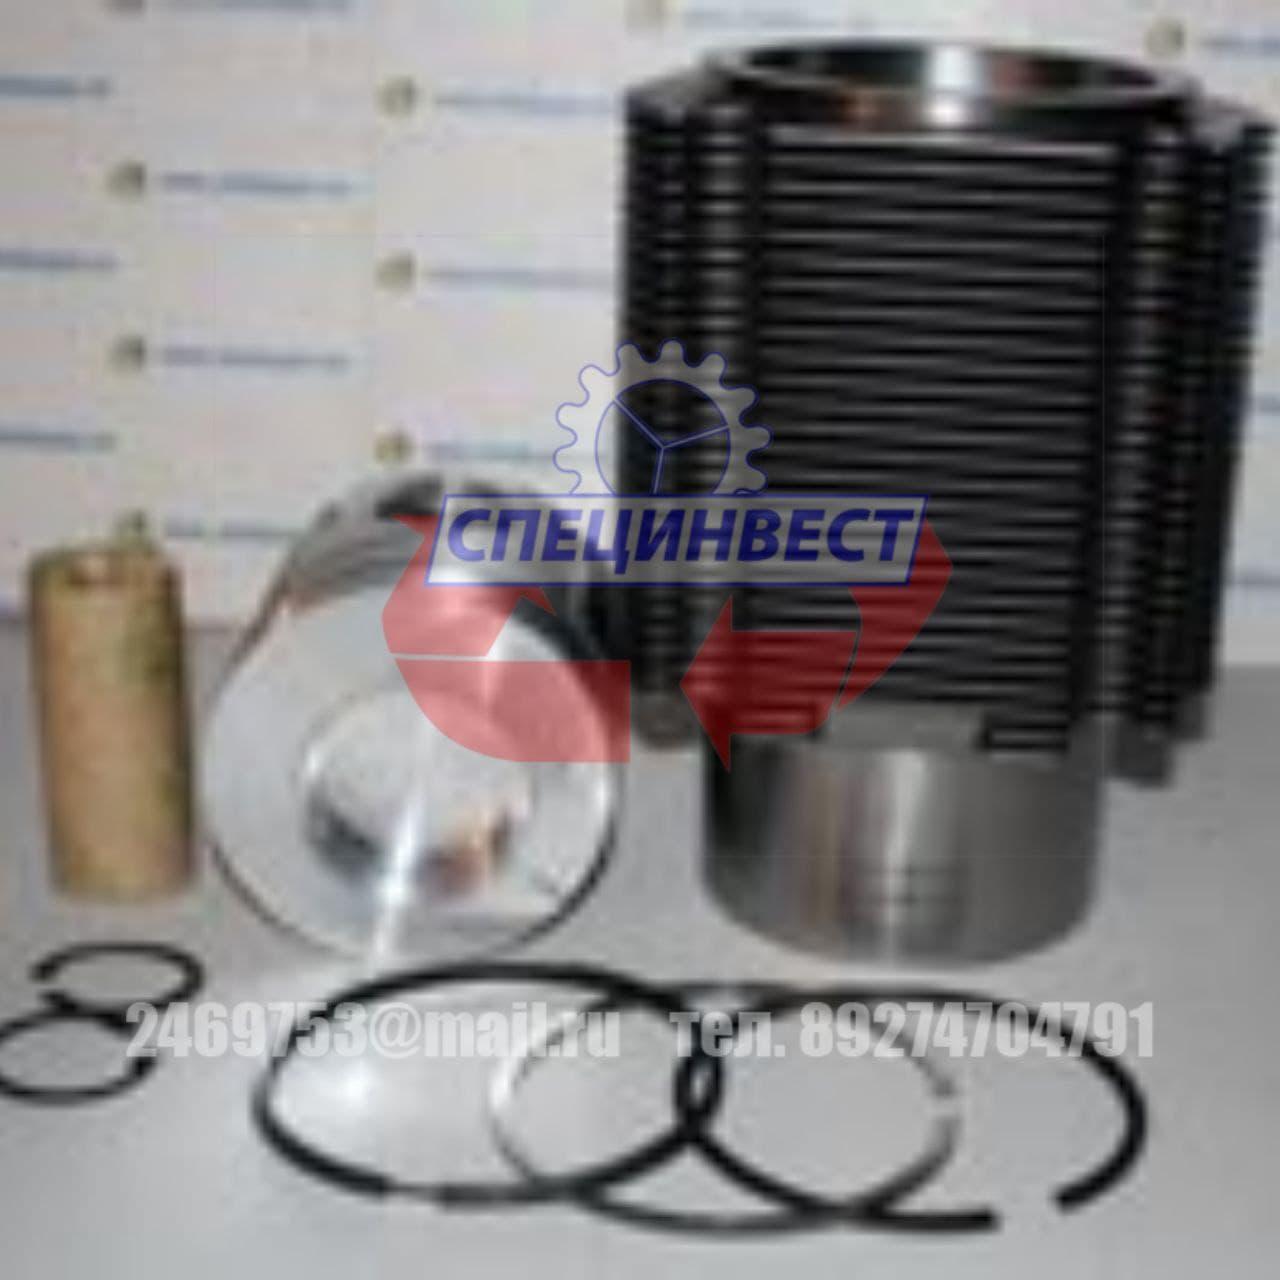 Цилиндр с поршнем T3B-928-10, 30 euro-II для 250S0